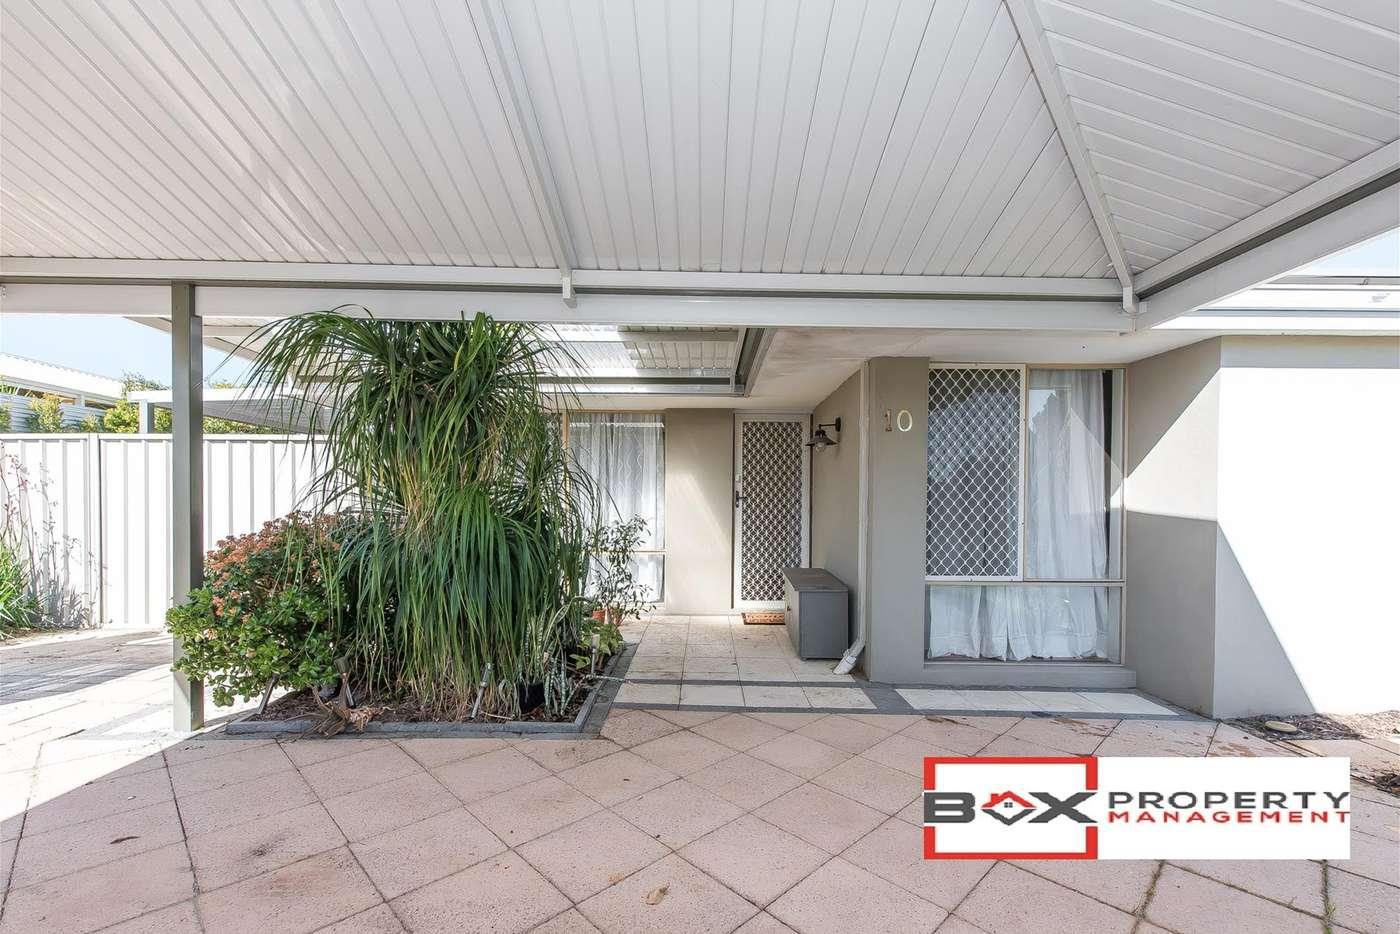 Main view of Homely house listing, 10 Thurburn Retreat, Marangaroo WA 6064